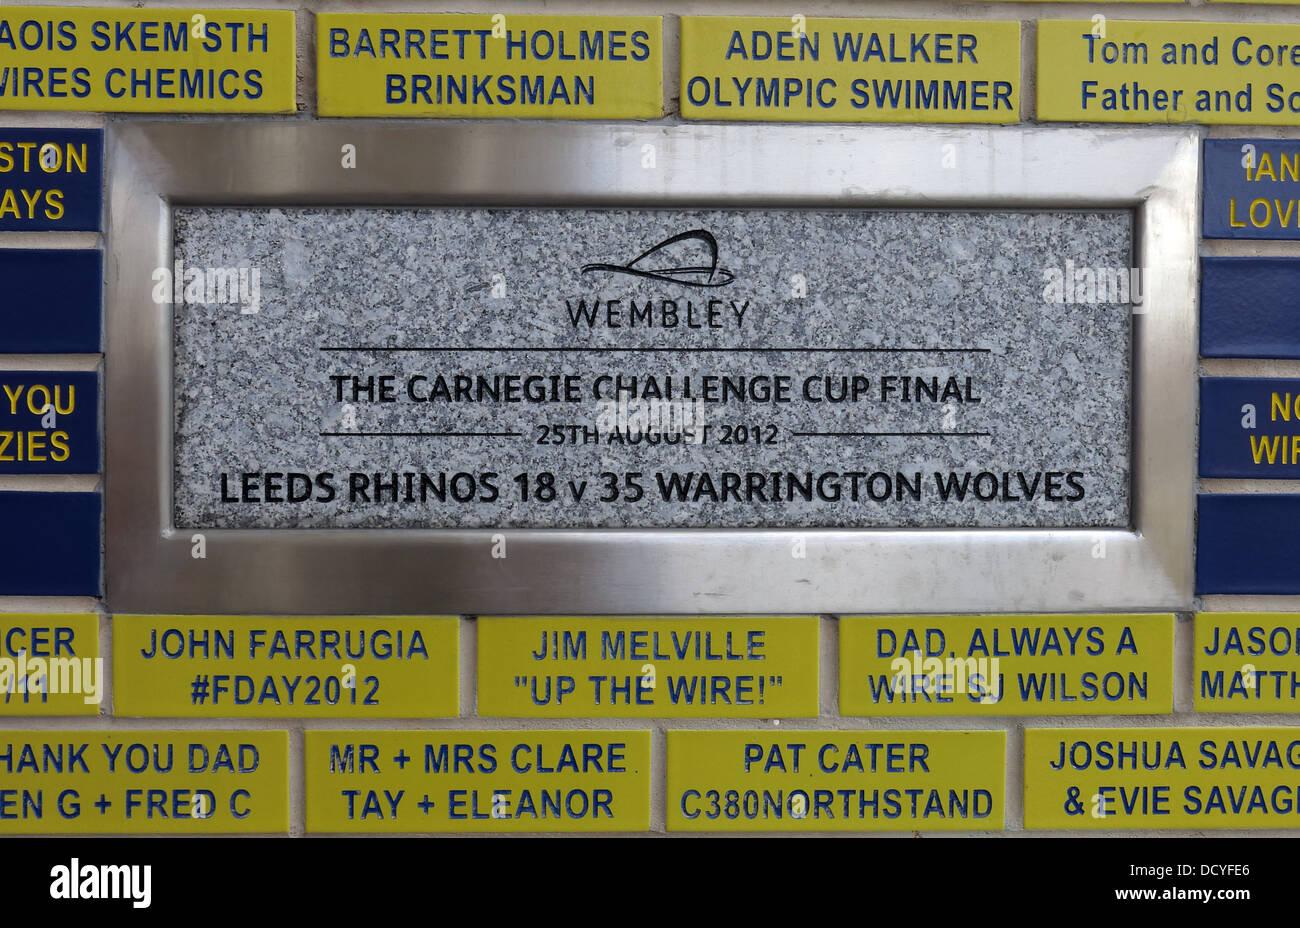 Laden Sie dieses Alamy Stockfoto Carnegie-Challenge-Cup-Finale Plaque Halliwell Jones Stadium, Mike Gregory Weg / Winwick Rd, Warrington, WA2 7NE - DCYFE6